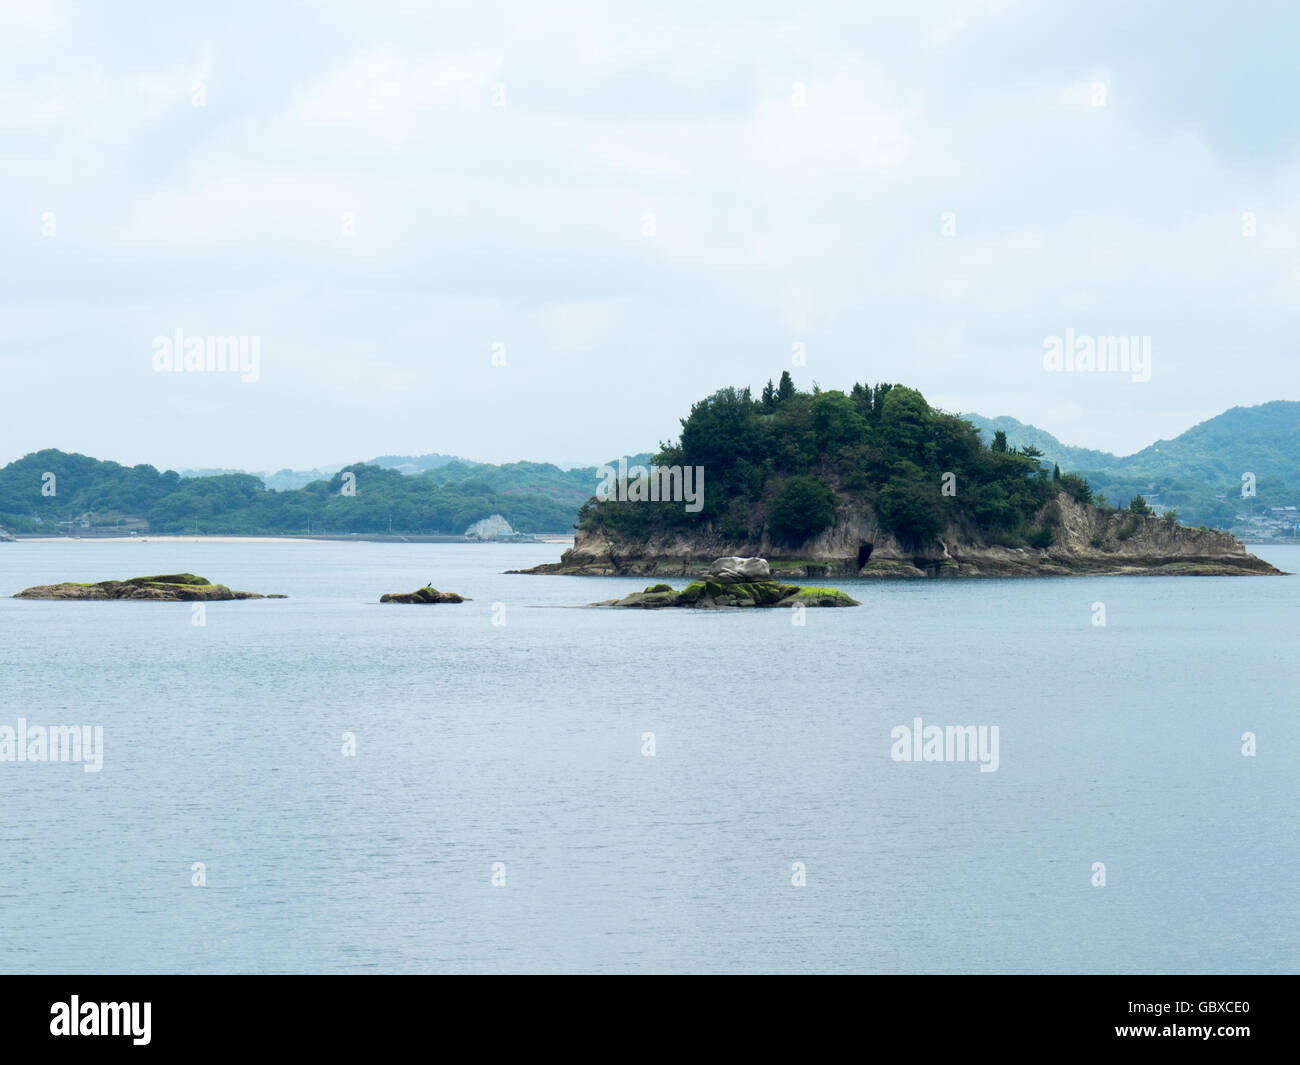 Islets and Innoshima Island in the Seto Inland Sea. - Stock Image